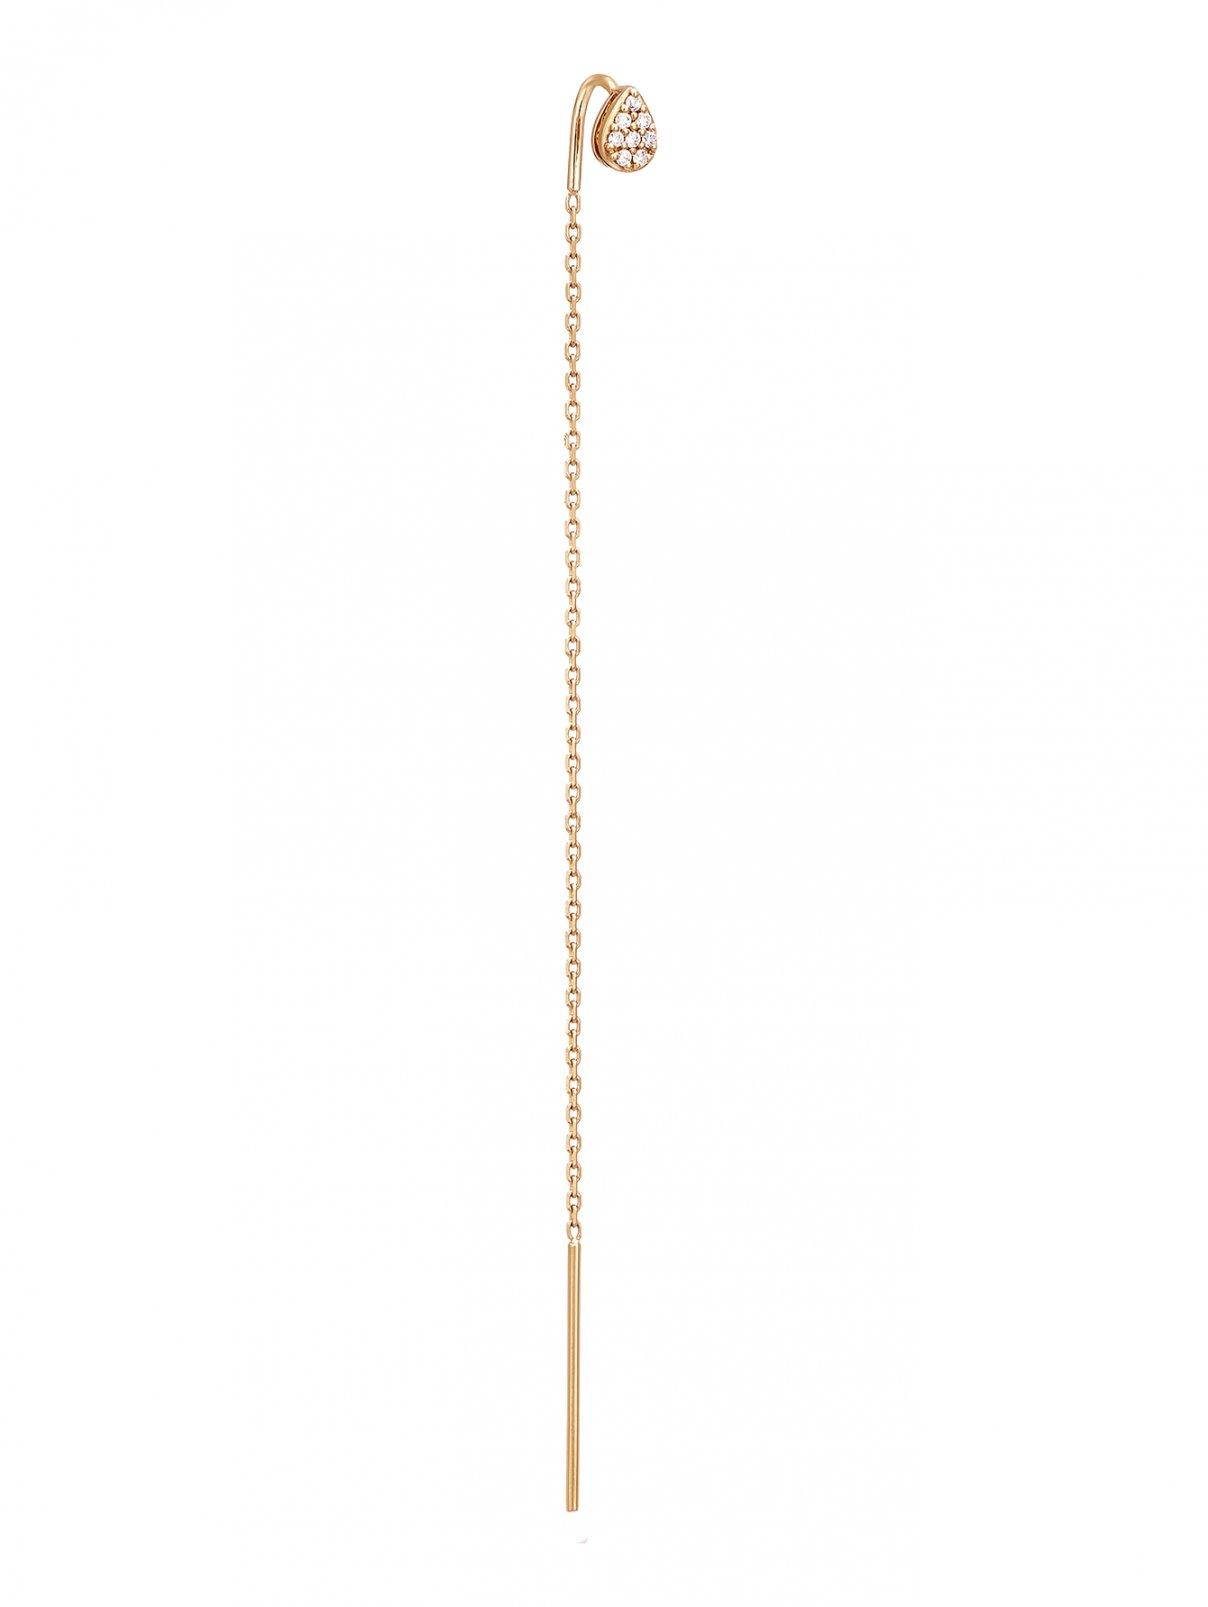 Серьги BU18012DI Ofee  –  Общий вид